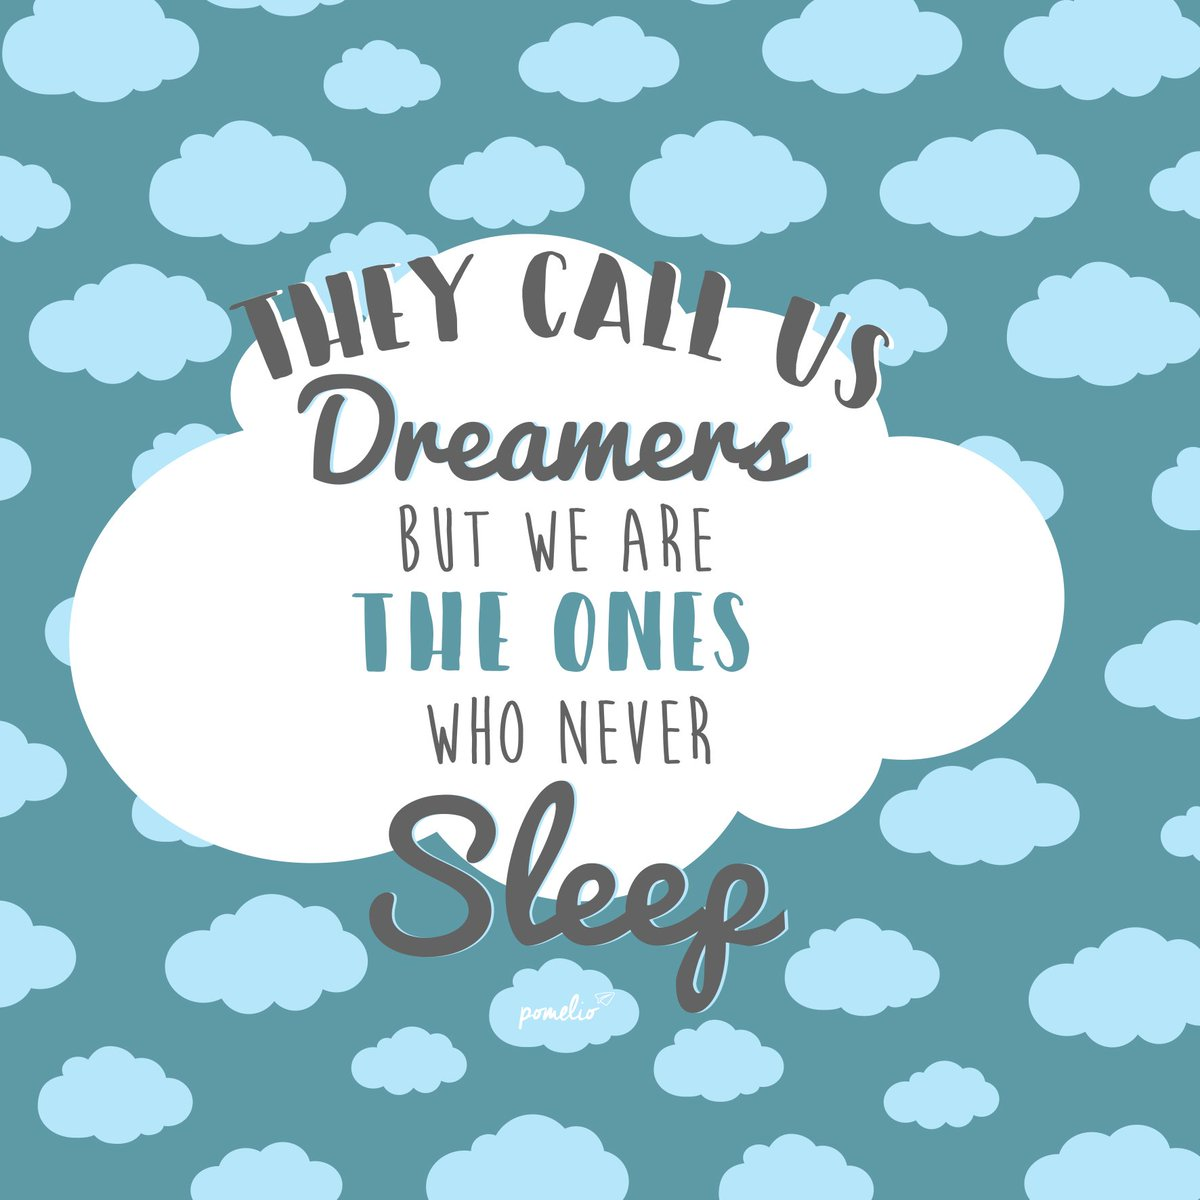 never stop dreaming #Pomelio #behappy #lifeisgood #dreamscometrue #regalos #regalosoriginales #regalapomelio #lifeisshort<br>http://pic.twitter.com/PHFLf14Gmf